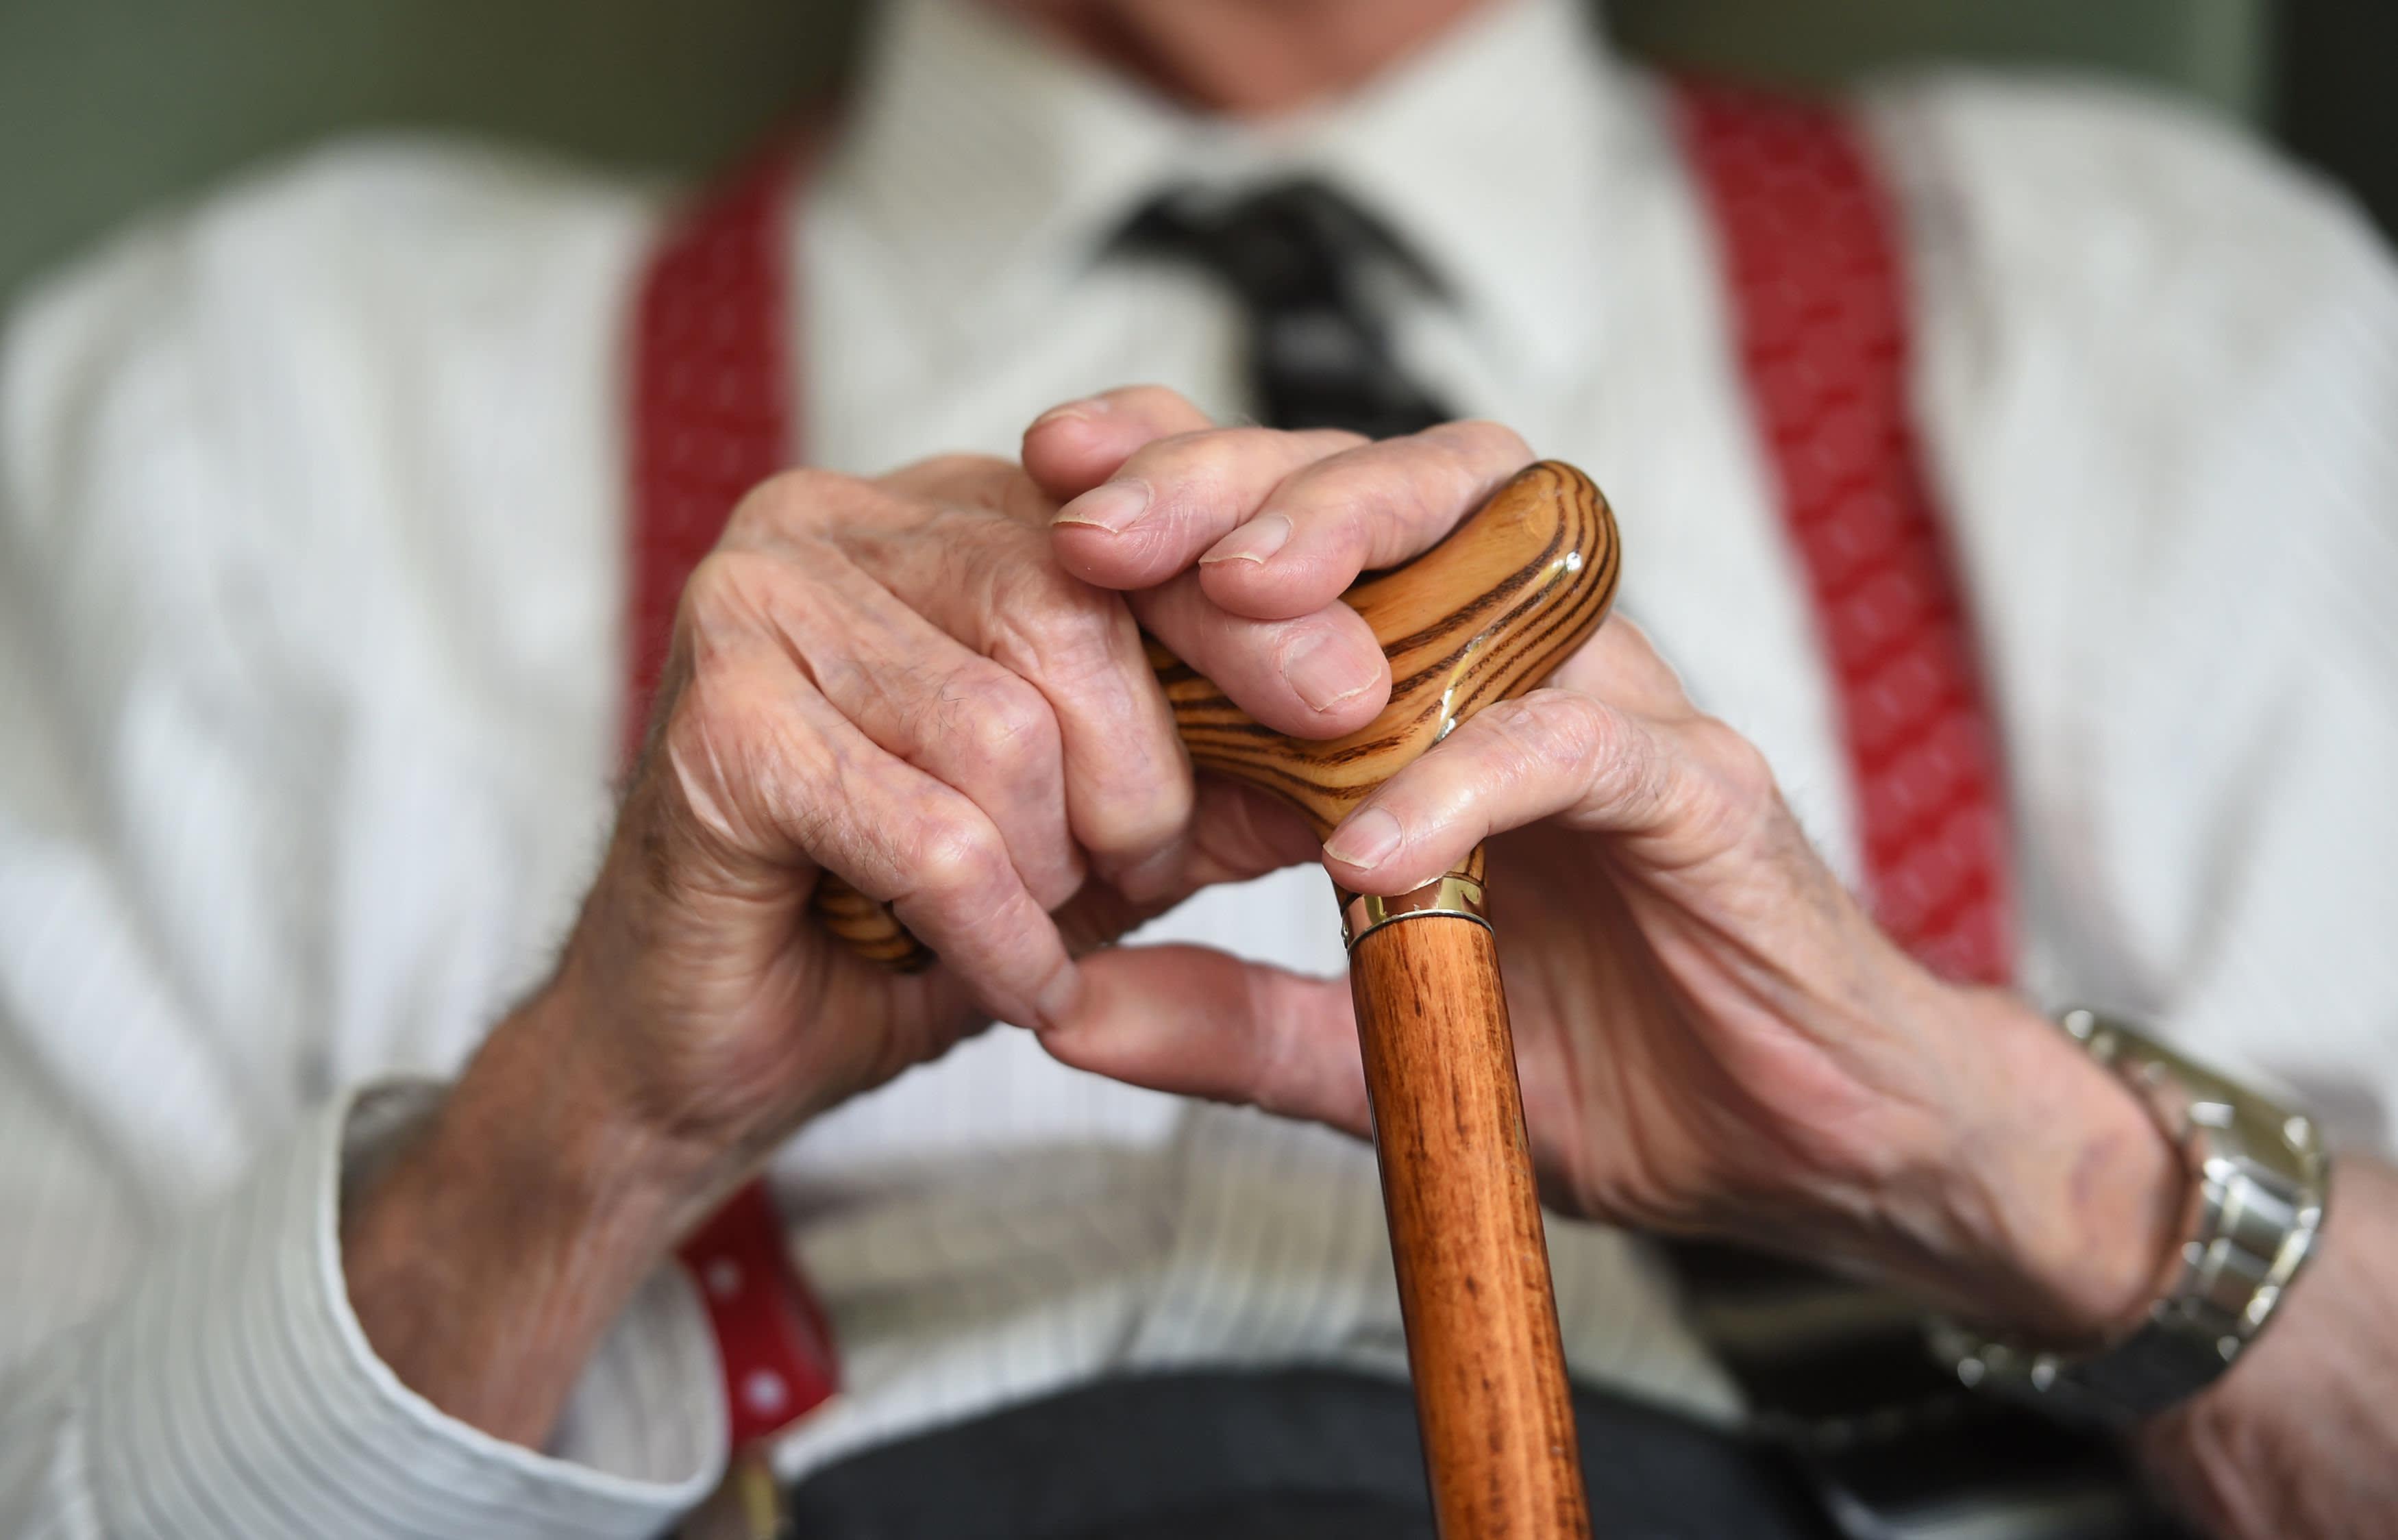 NAO report calls for urgent social care reform